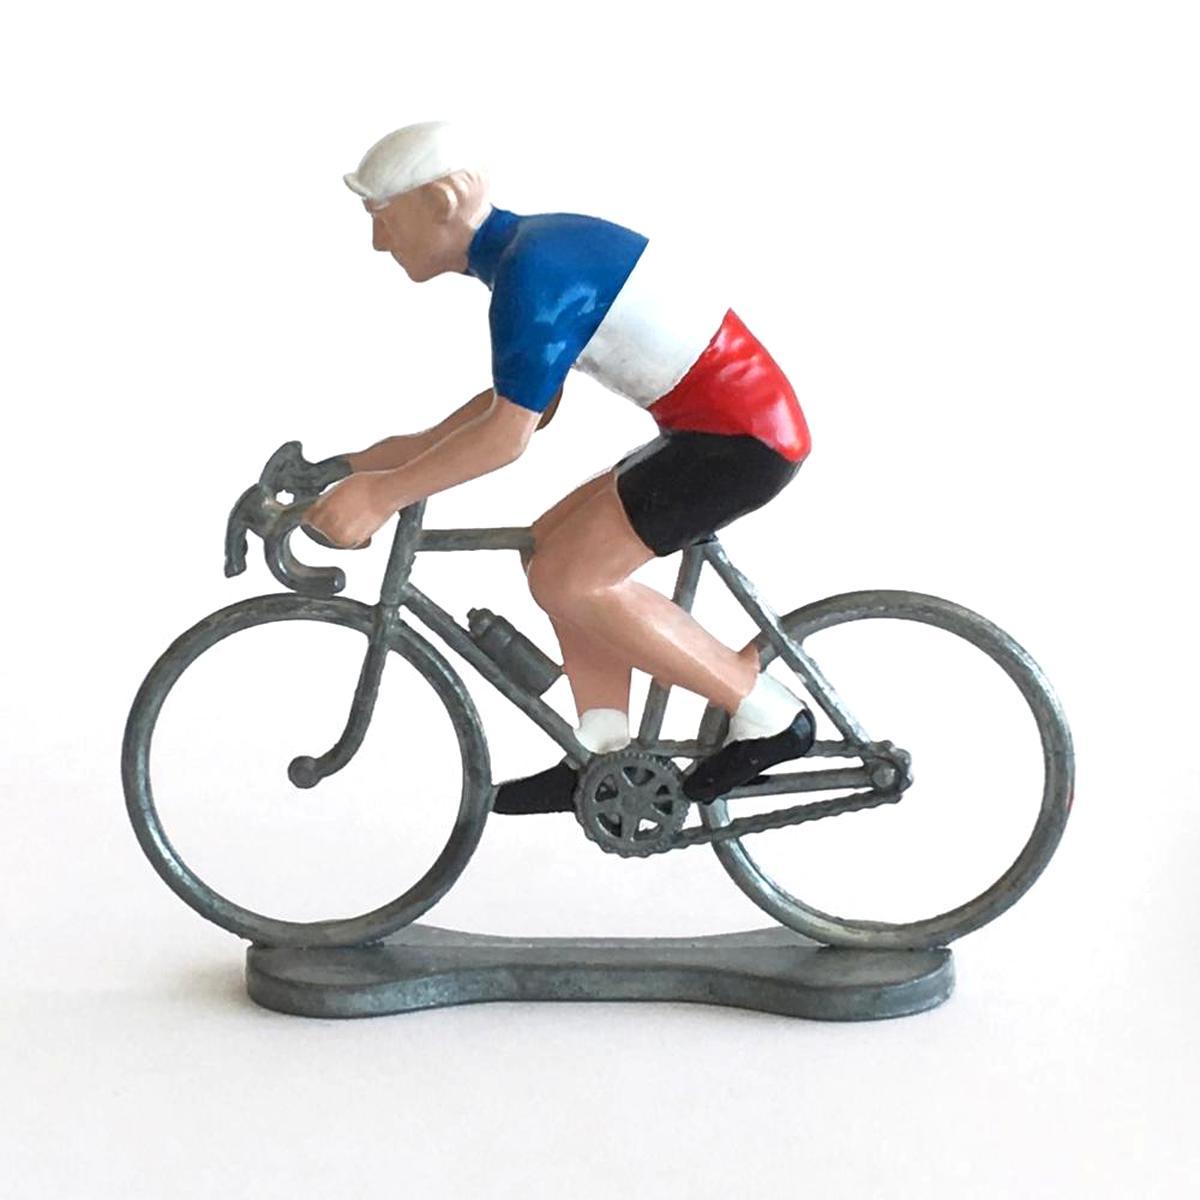 cycliste figurine d'occasion